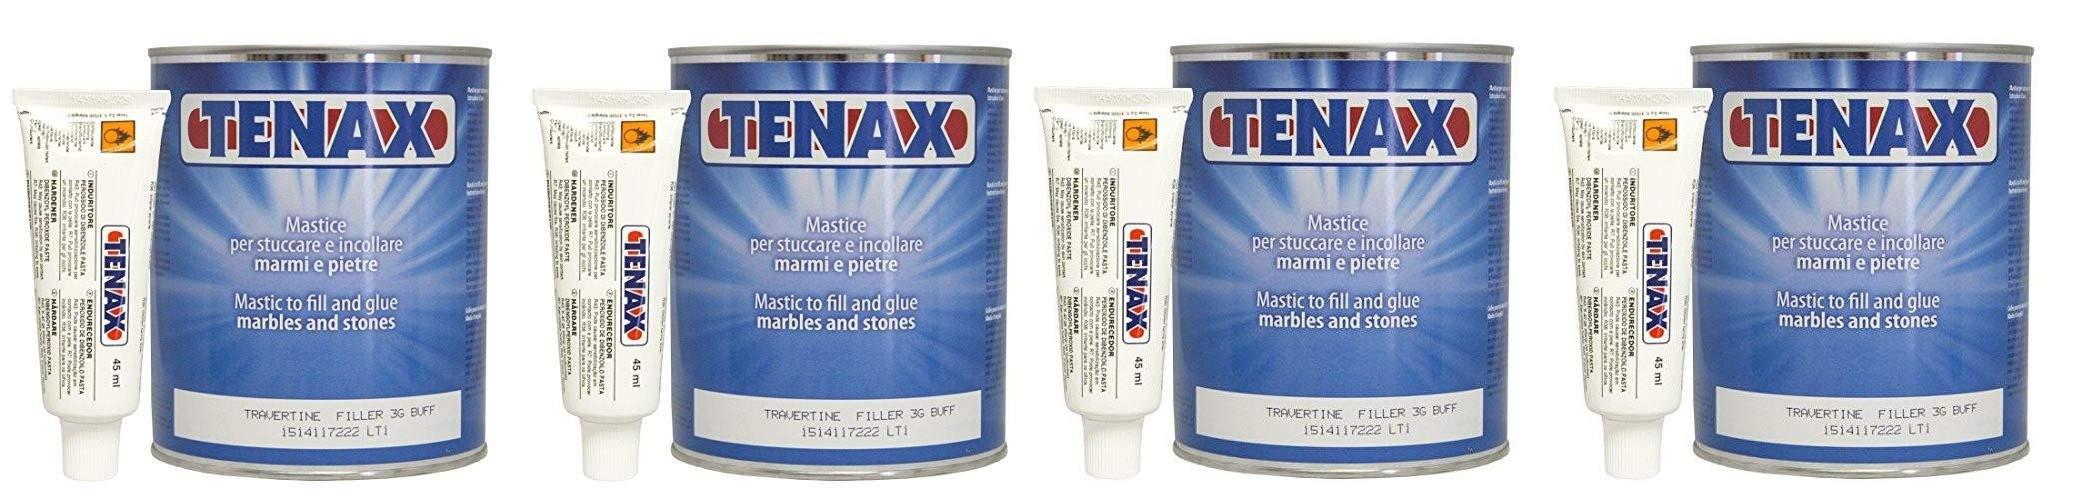 Tenax Travertine Filler - 1 liter (Pack of 4)